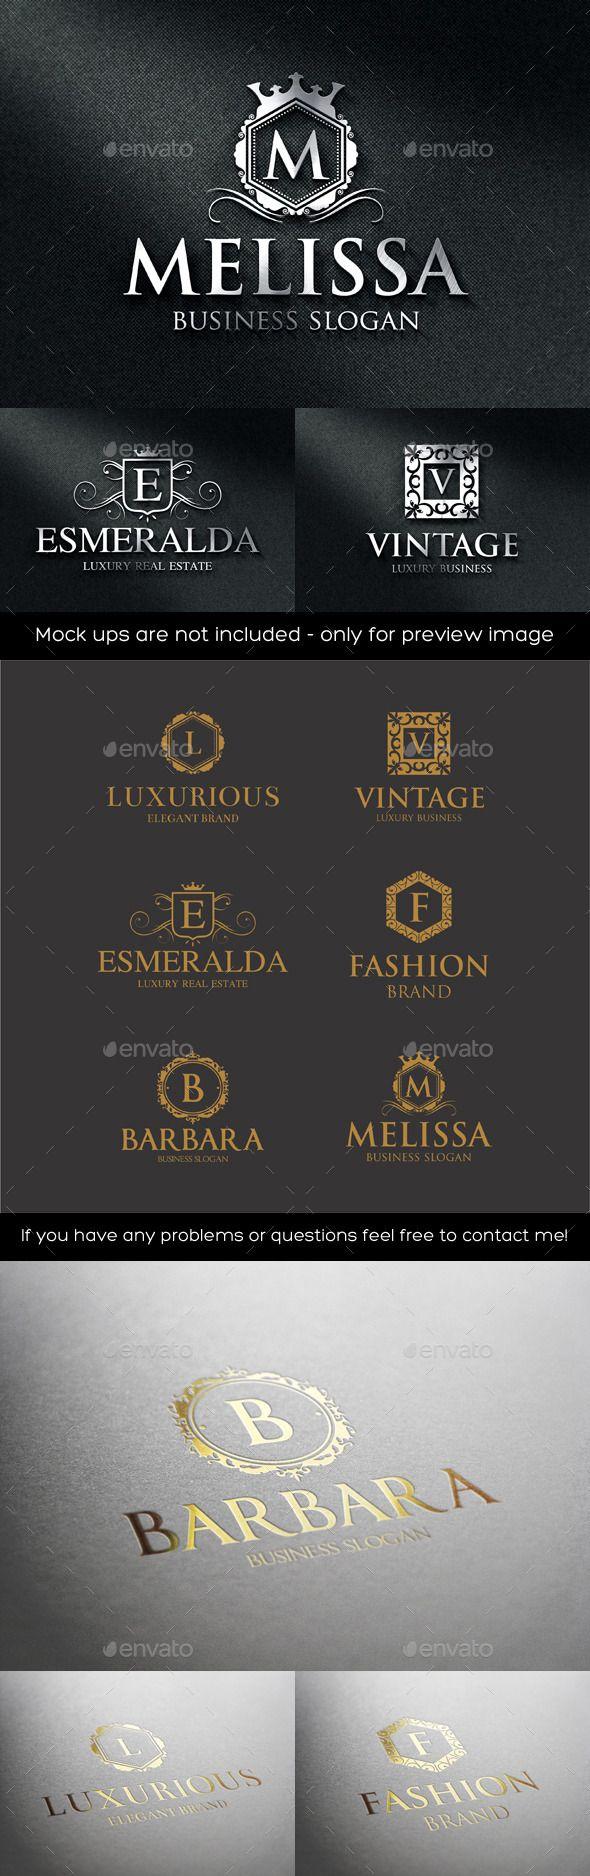 Wonderful Luxurious Elegant Vintage Boutique Logos   Badges U0026 Stickers Web Elements